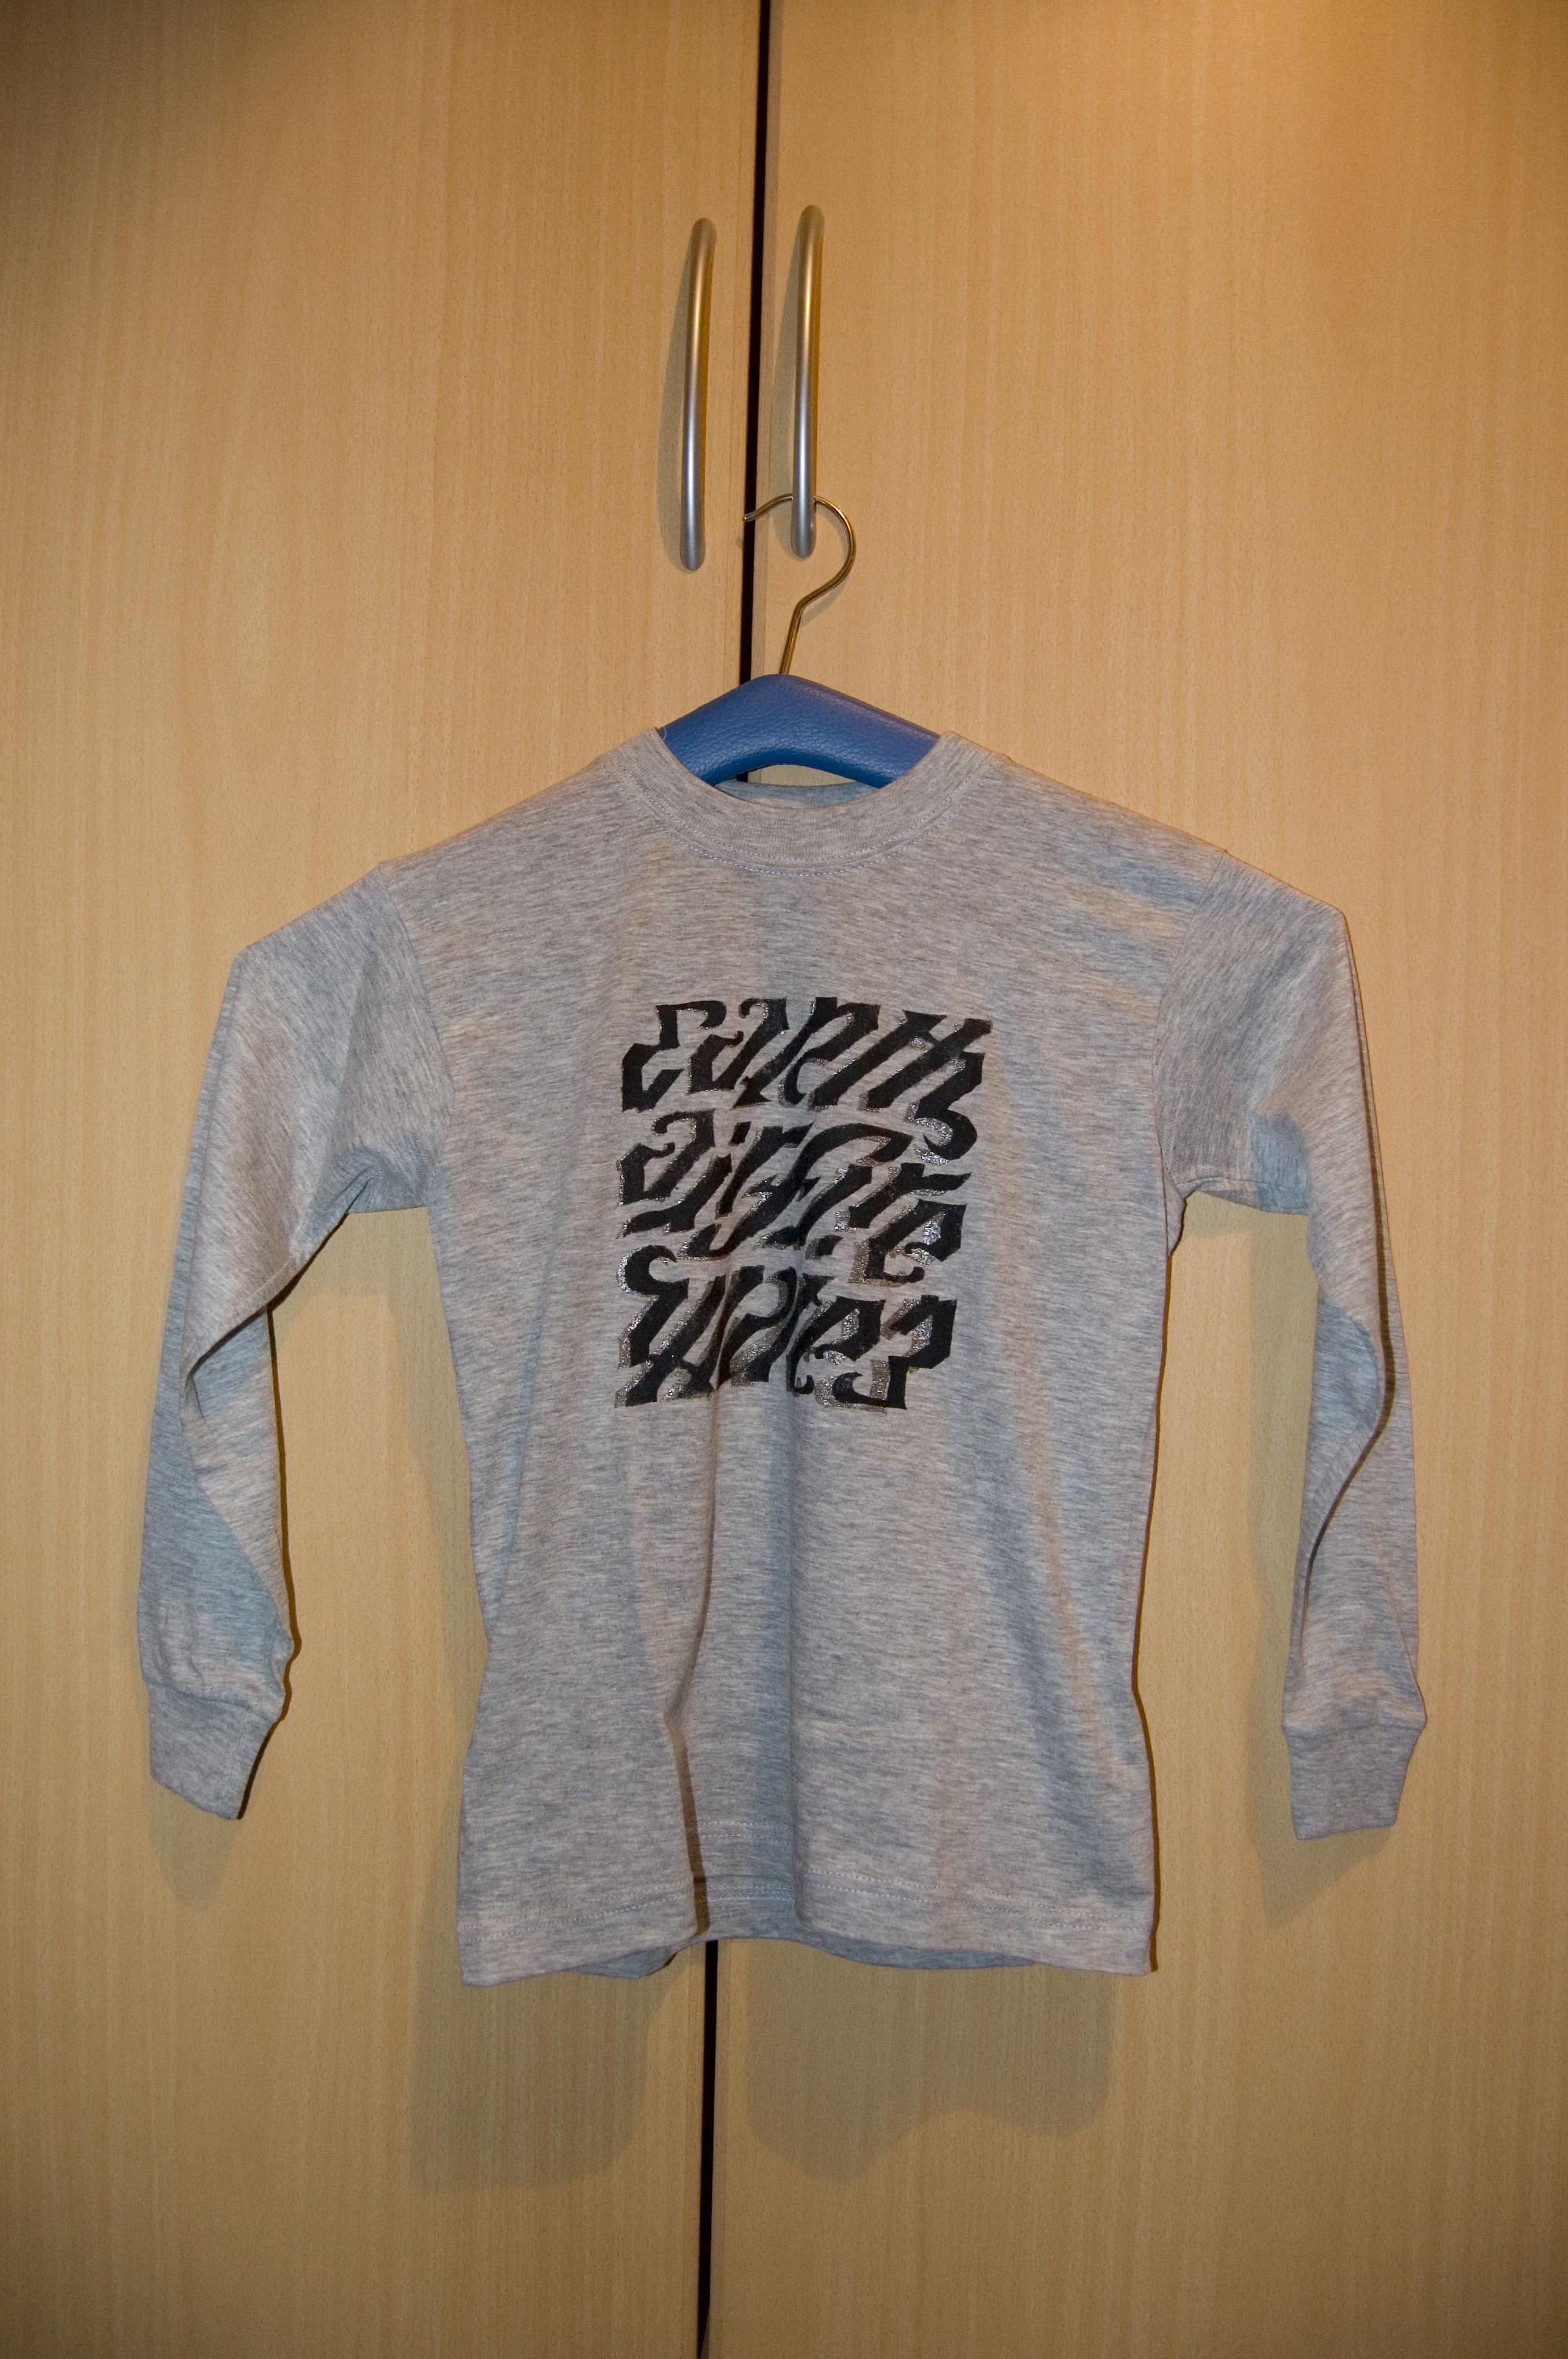 2012_DSC2454D trička vyr